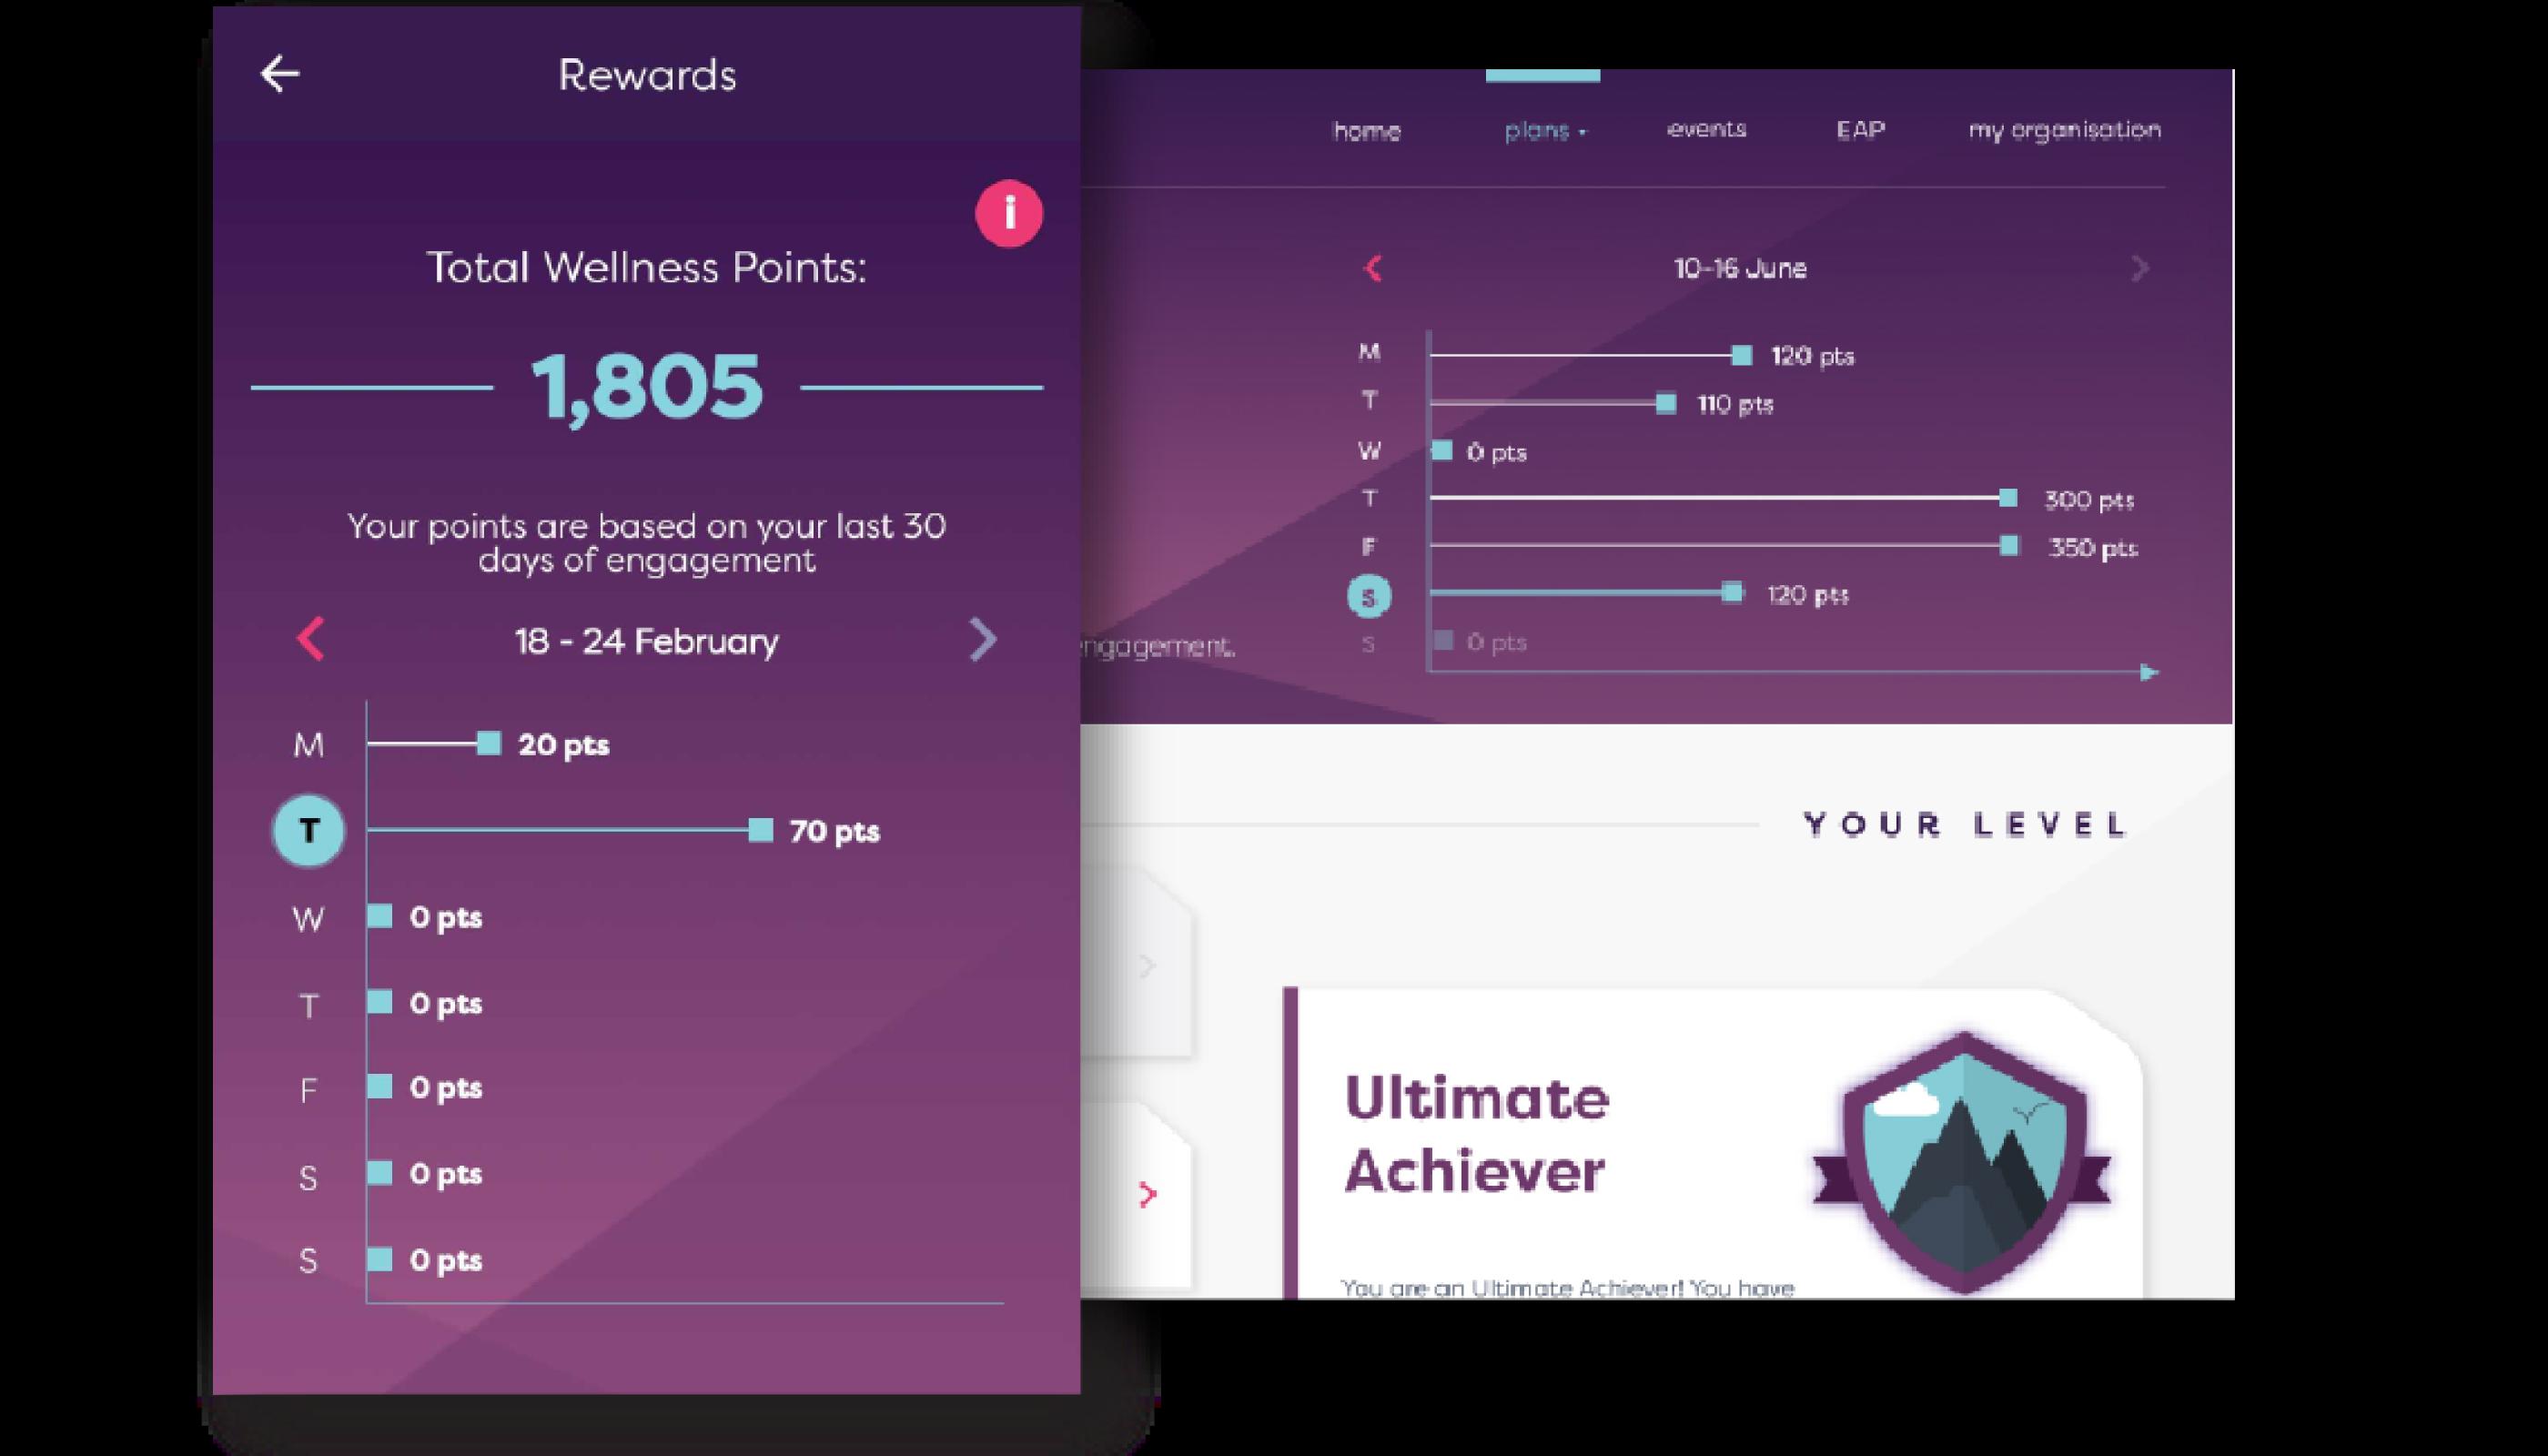 rewards_incentives2